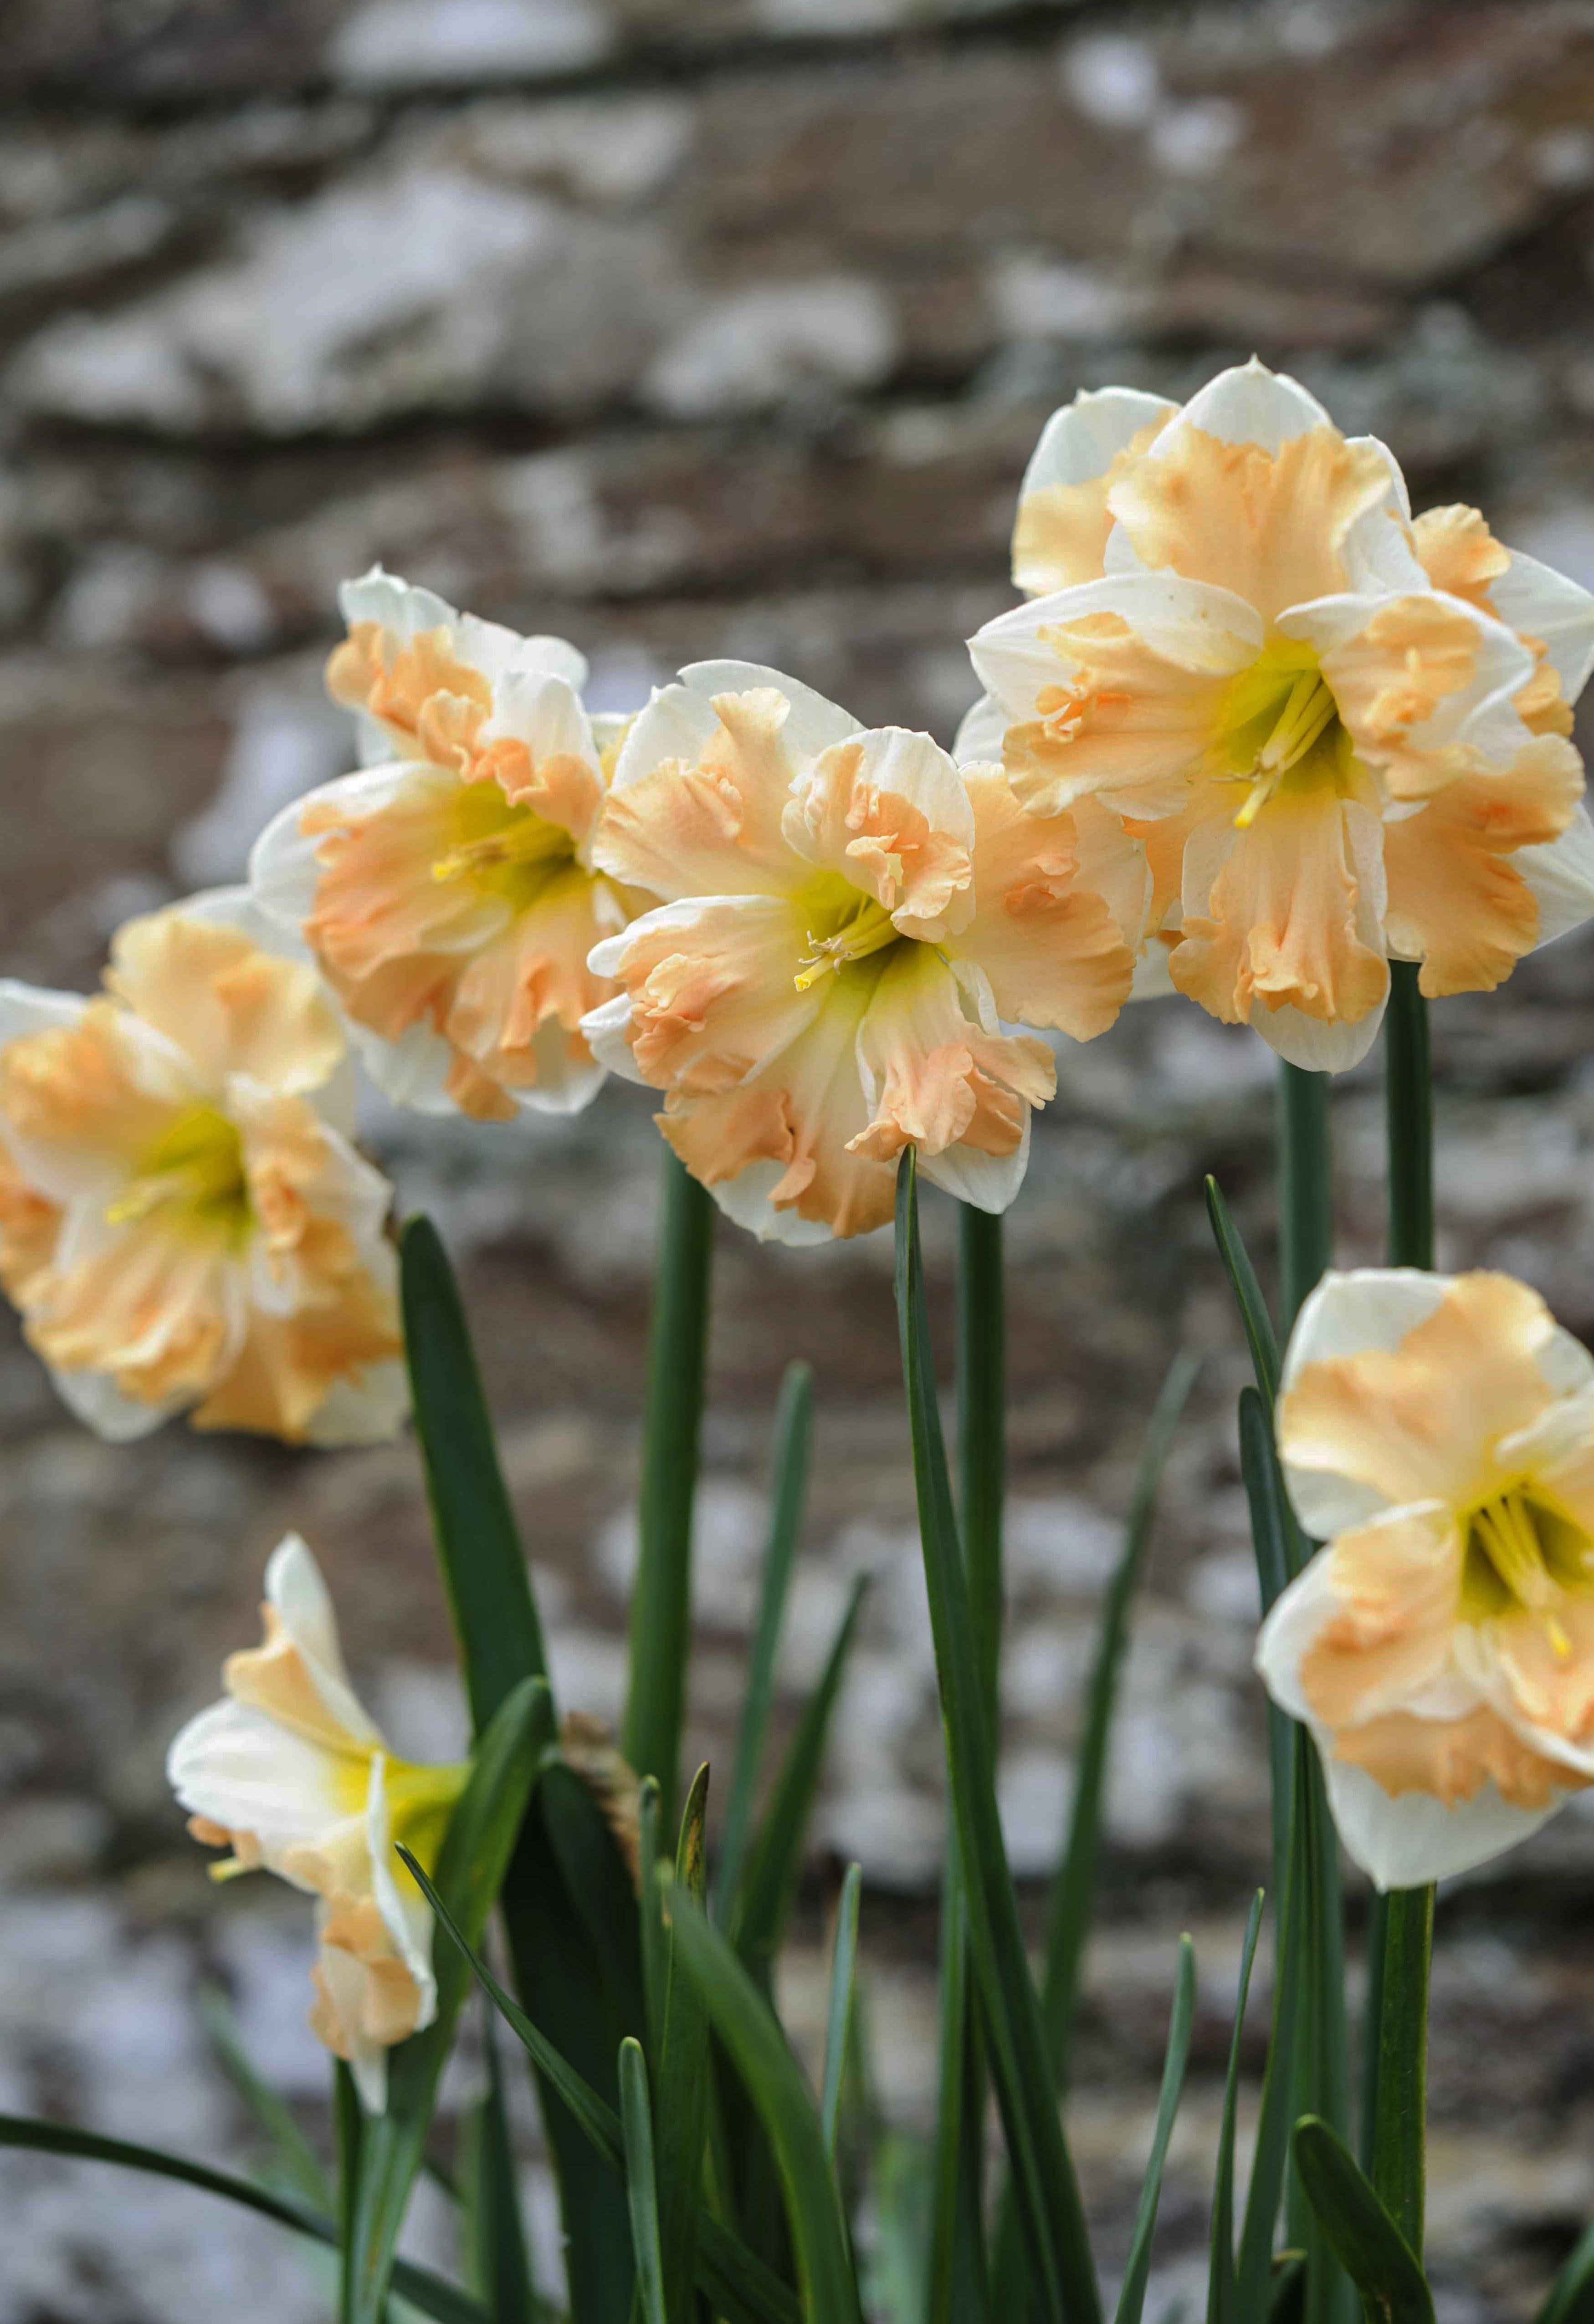 daffodils-photo-2